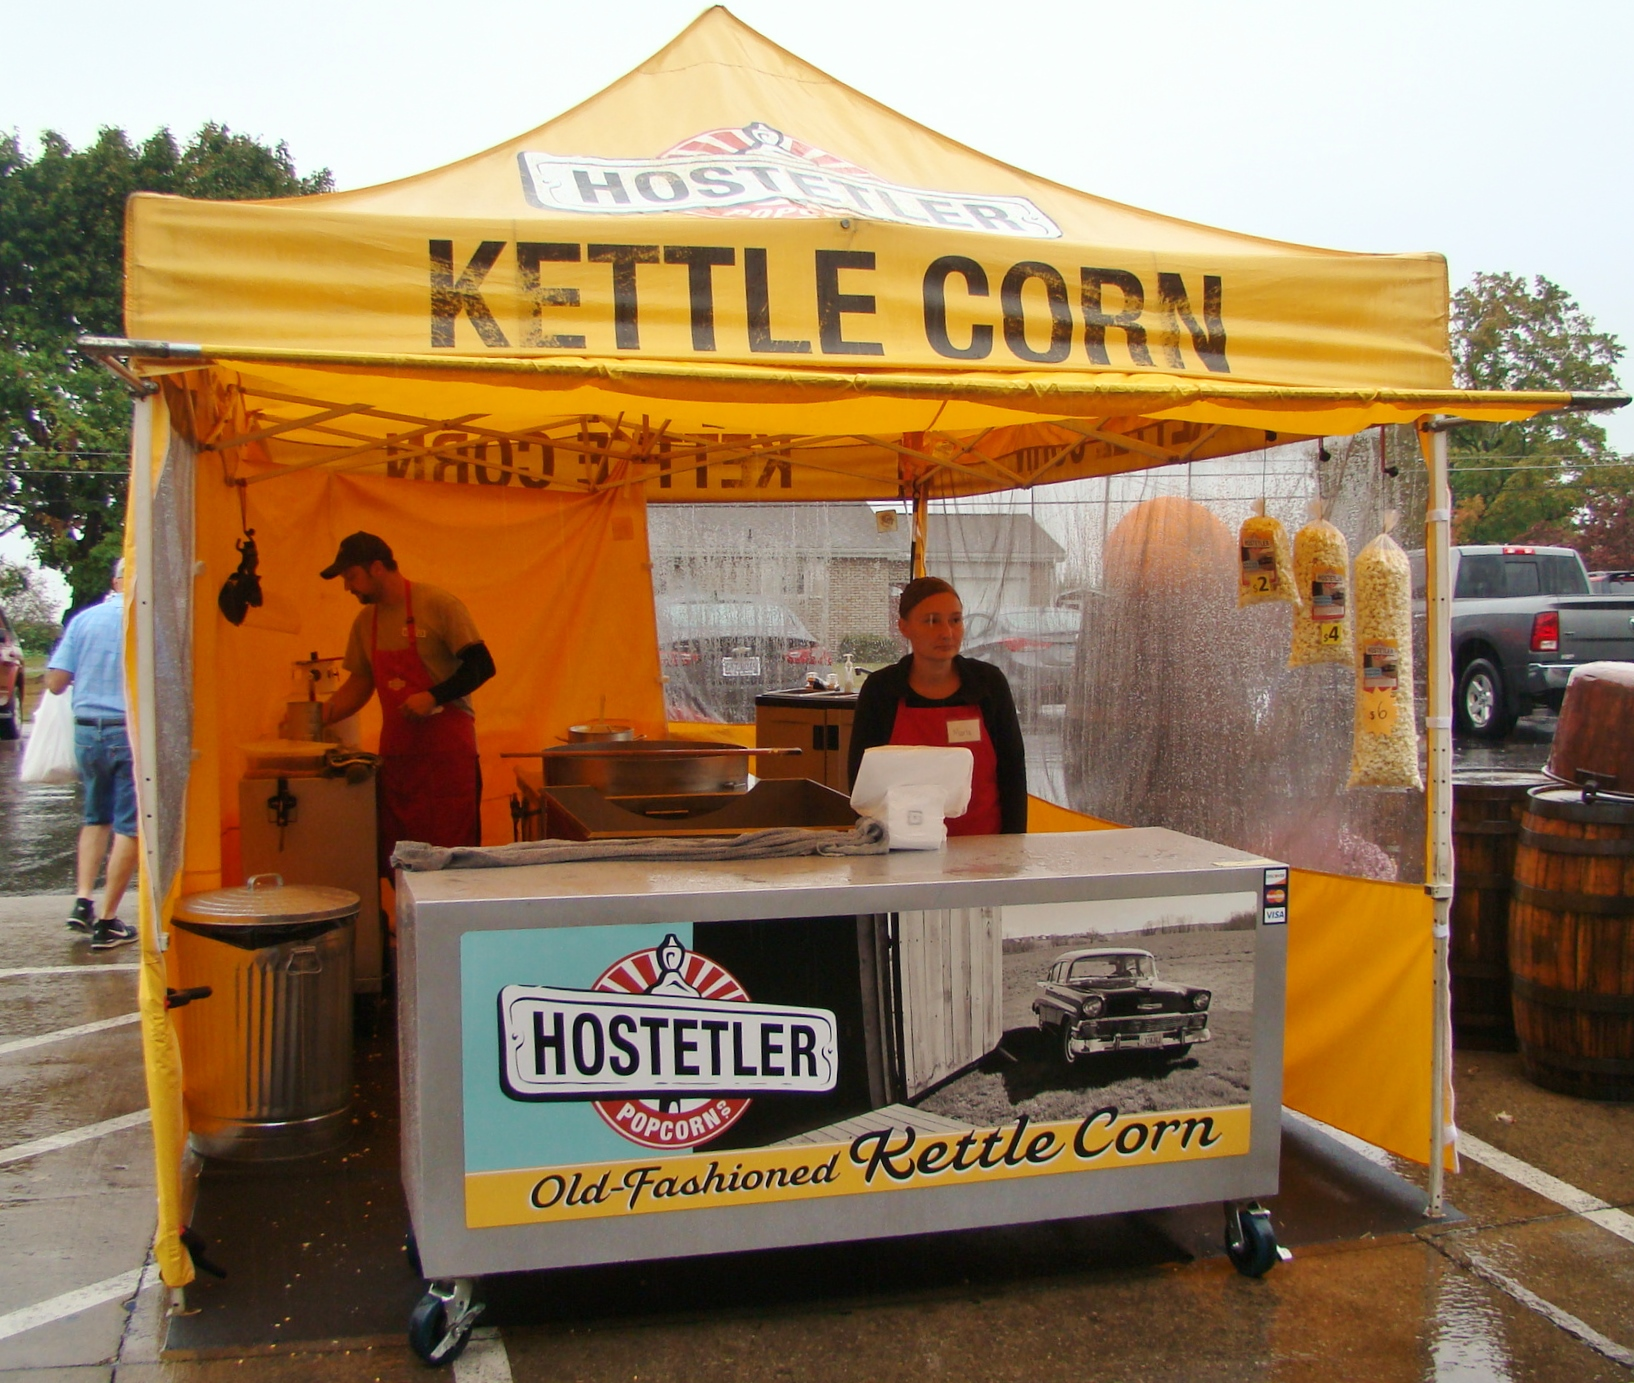 Hillcrest Kettle Corn